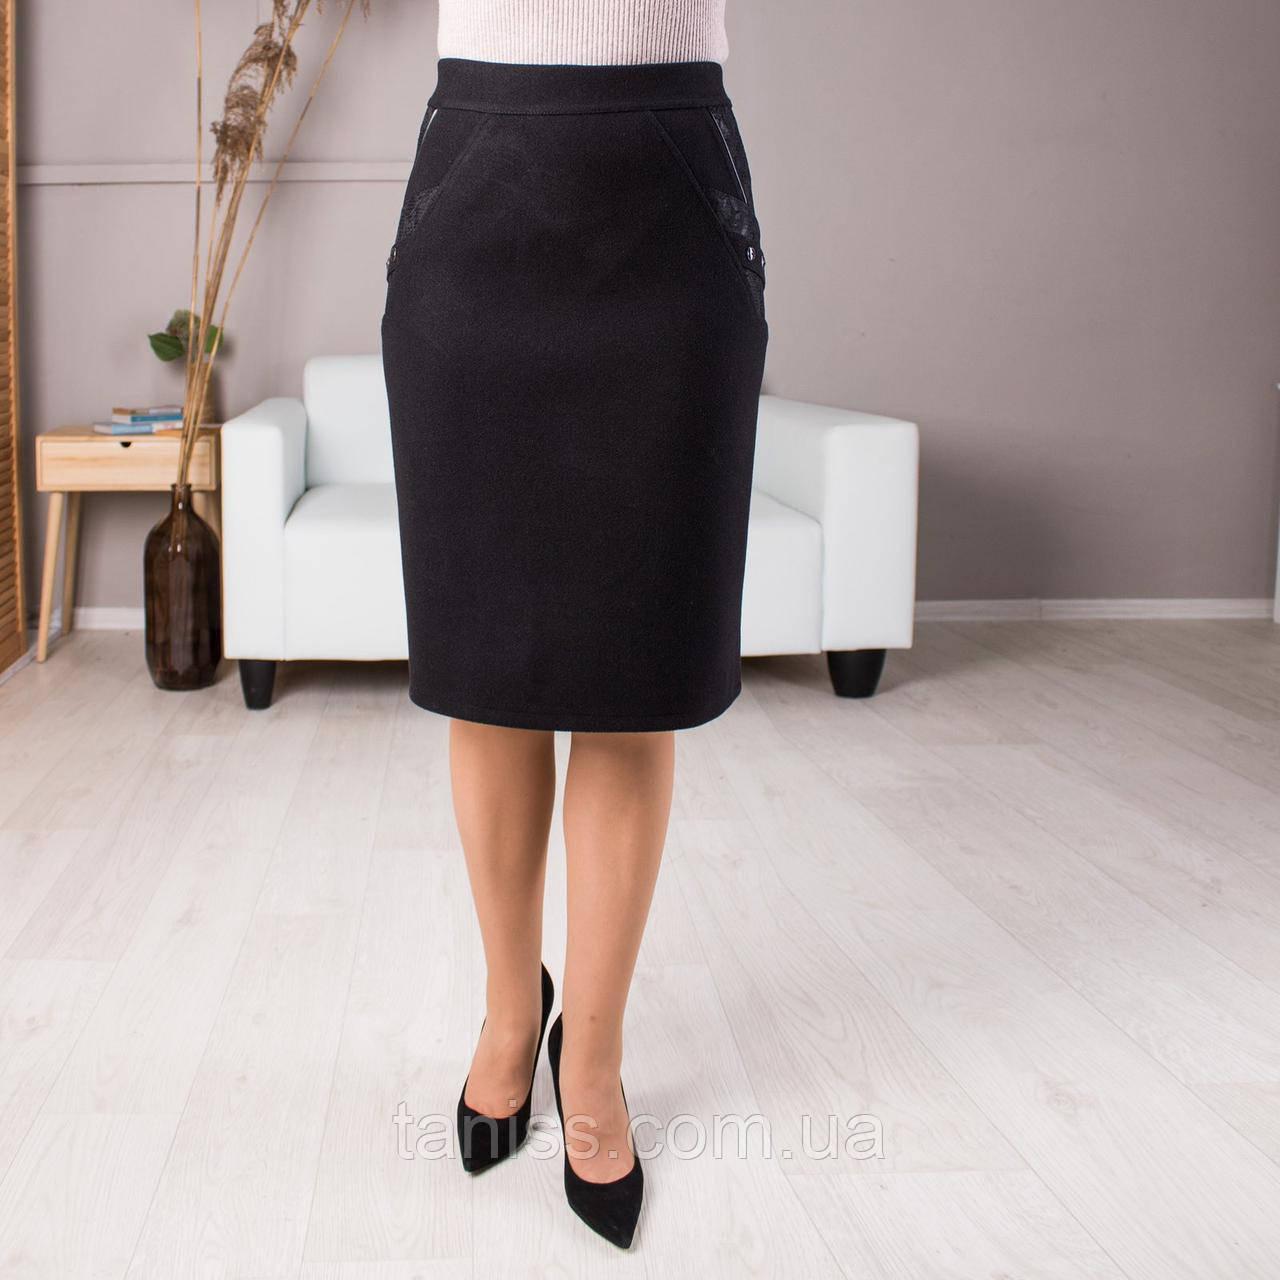 "Женская юбка""Нино"",ткань пальтовая, р-р 54,56,58, черная, спідниця"